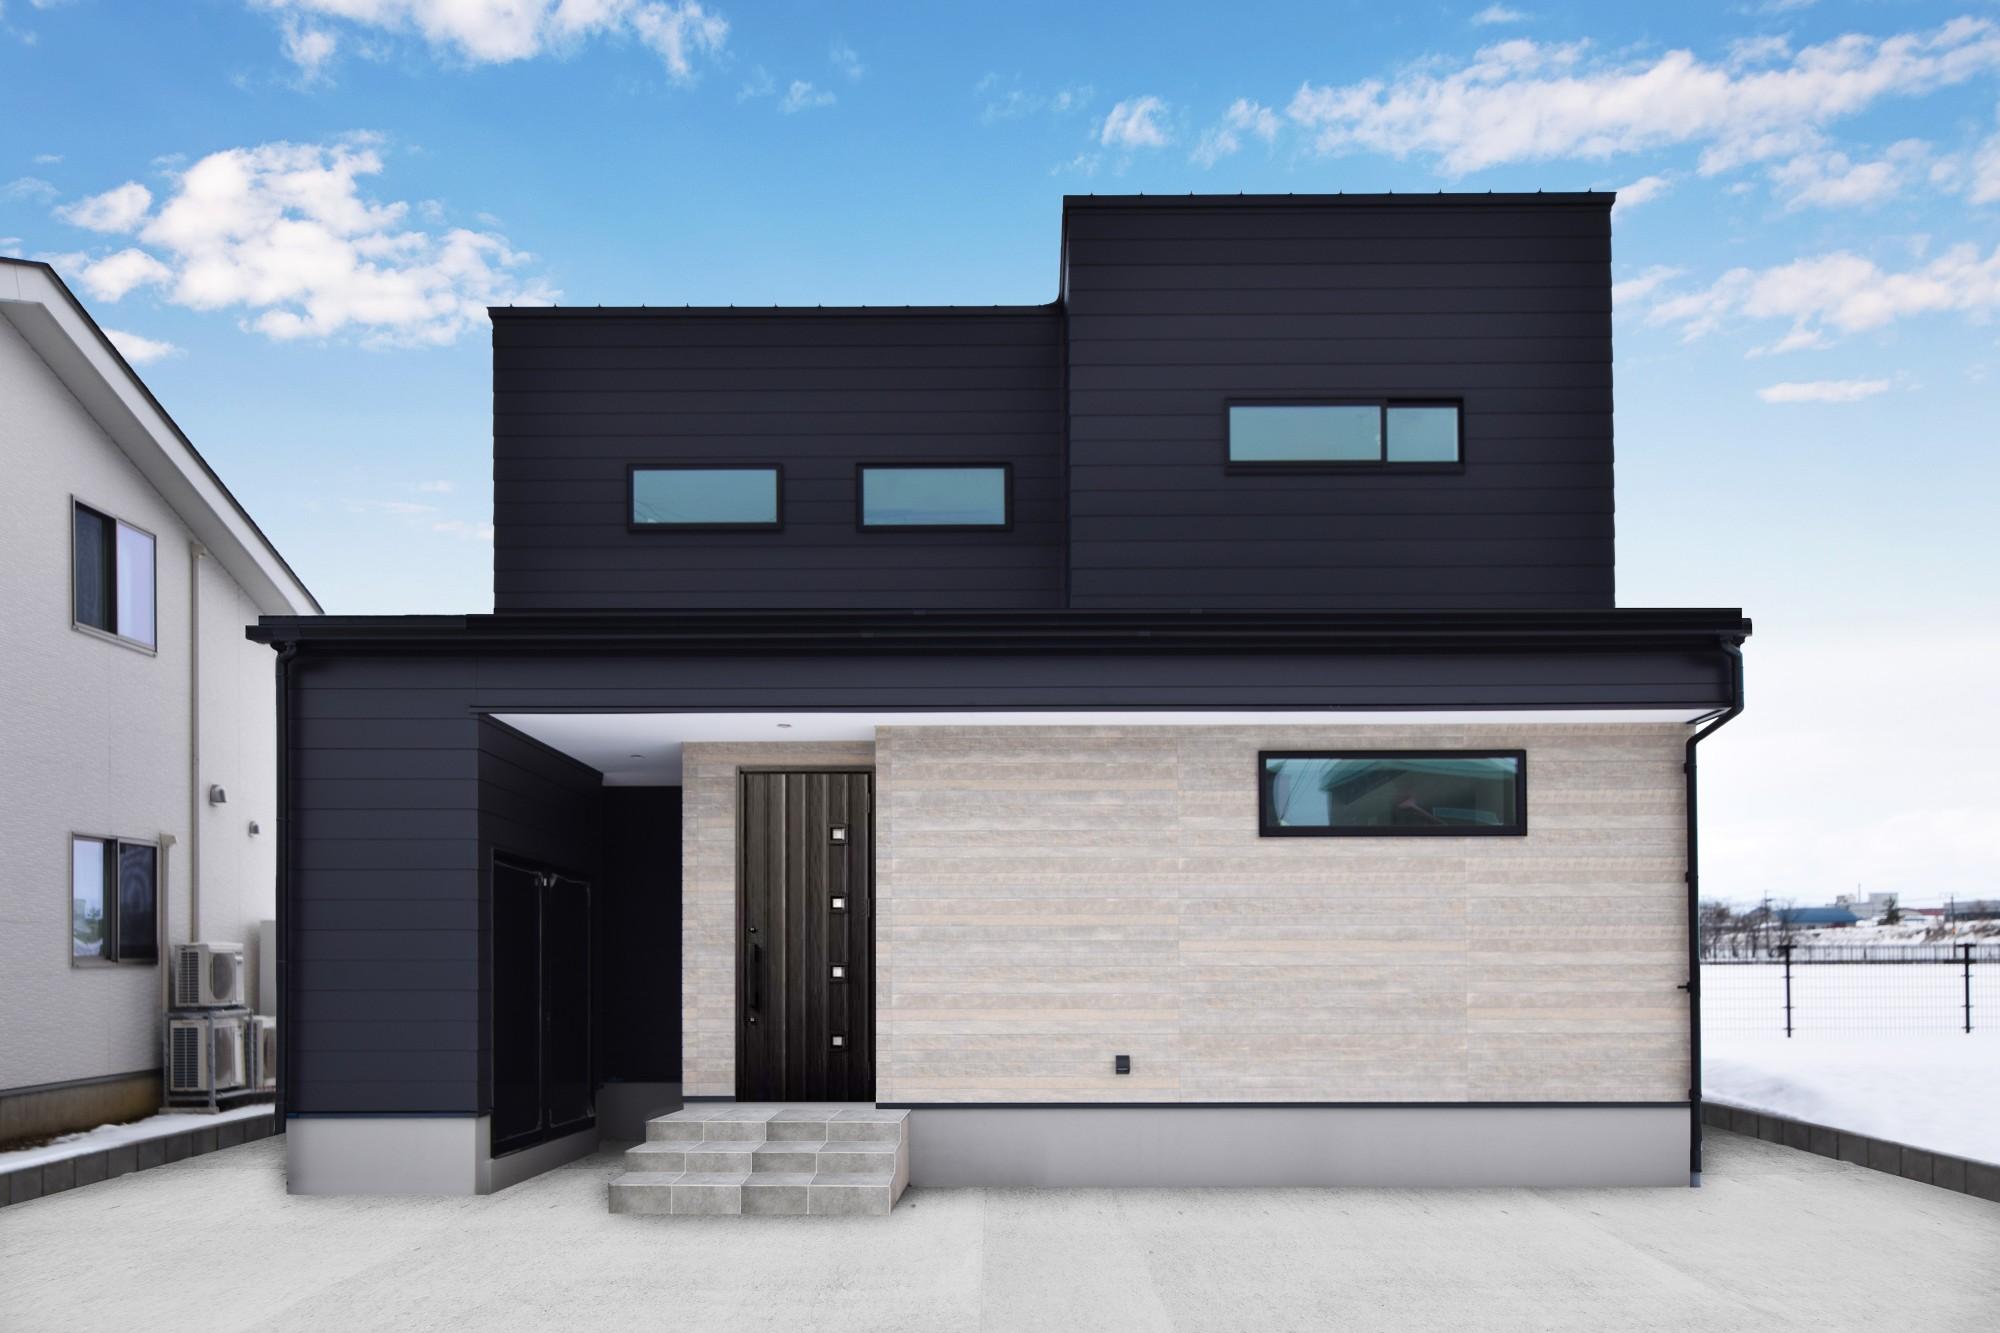 DETAIL HOME(ディテールホーム)「おうち時間を大切にした住まい」のシンプル・ナチュラルな外観の実例写真